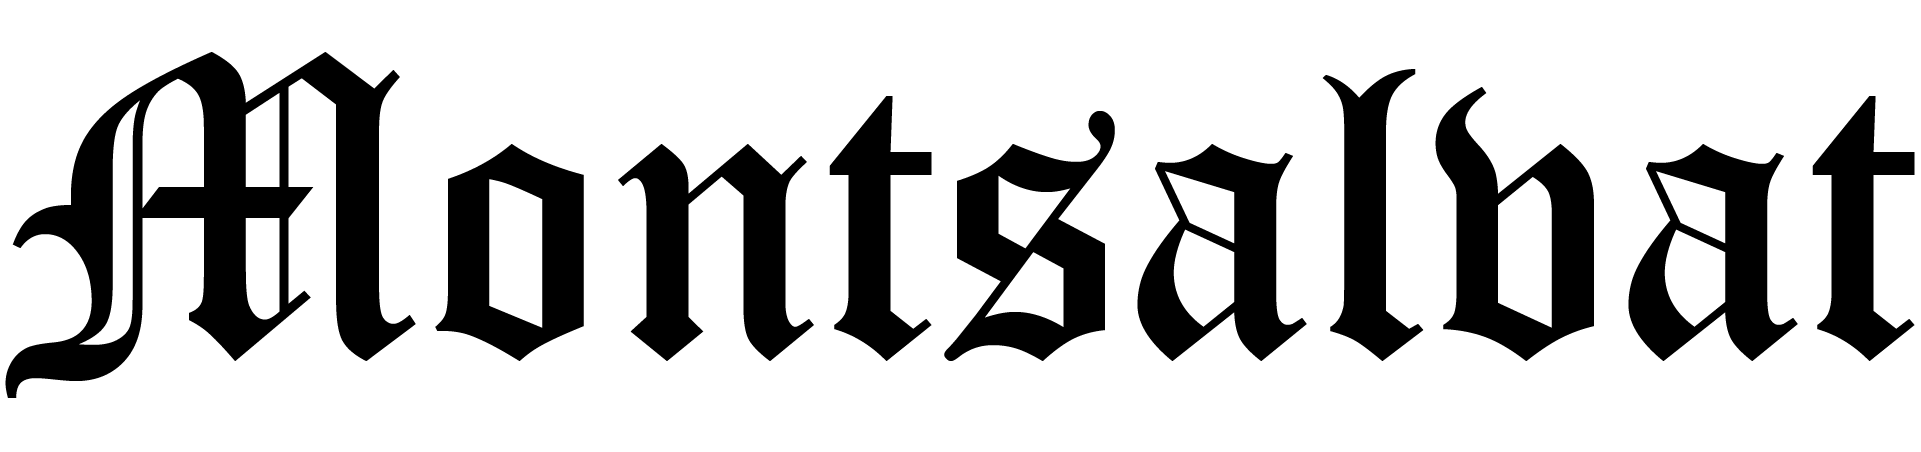 Montsalvat logo transparent background.png